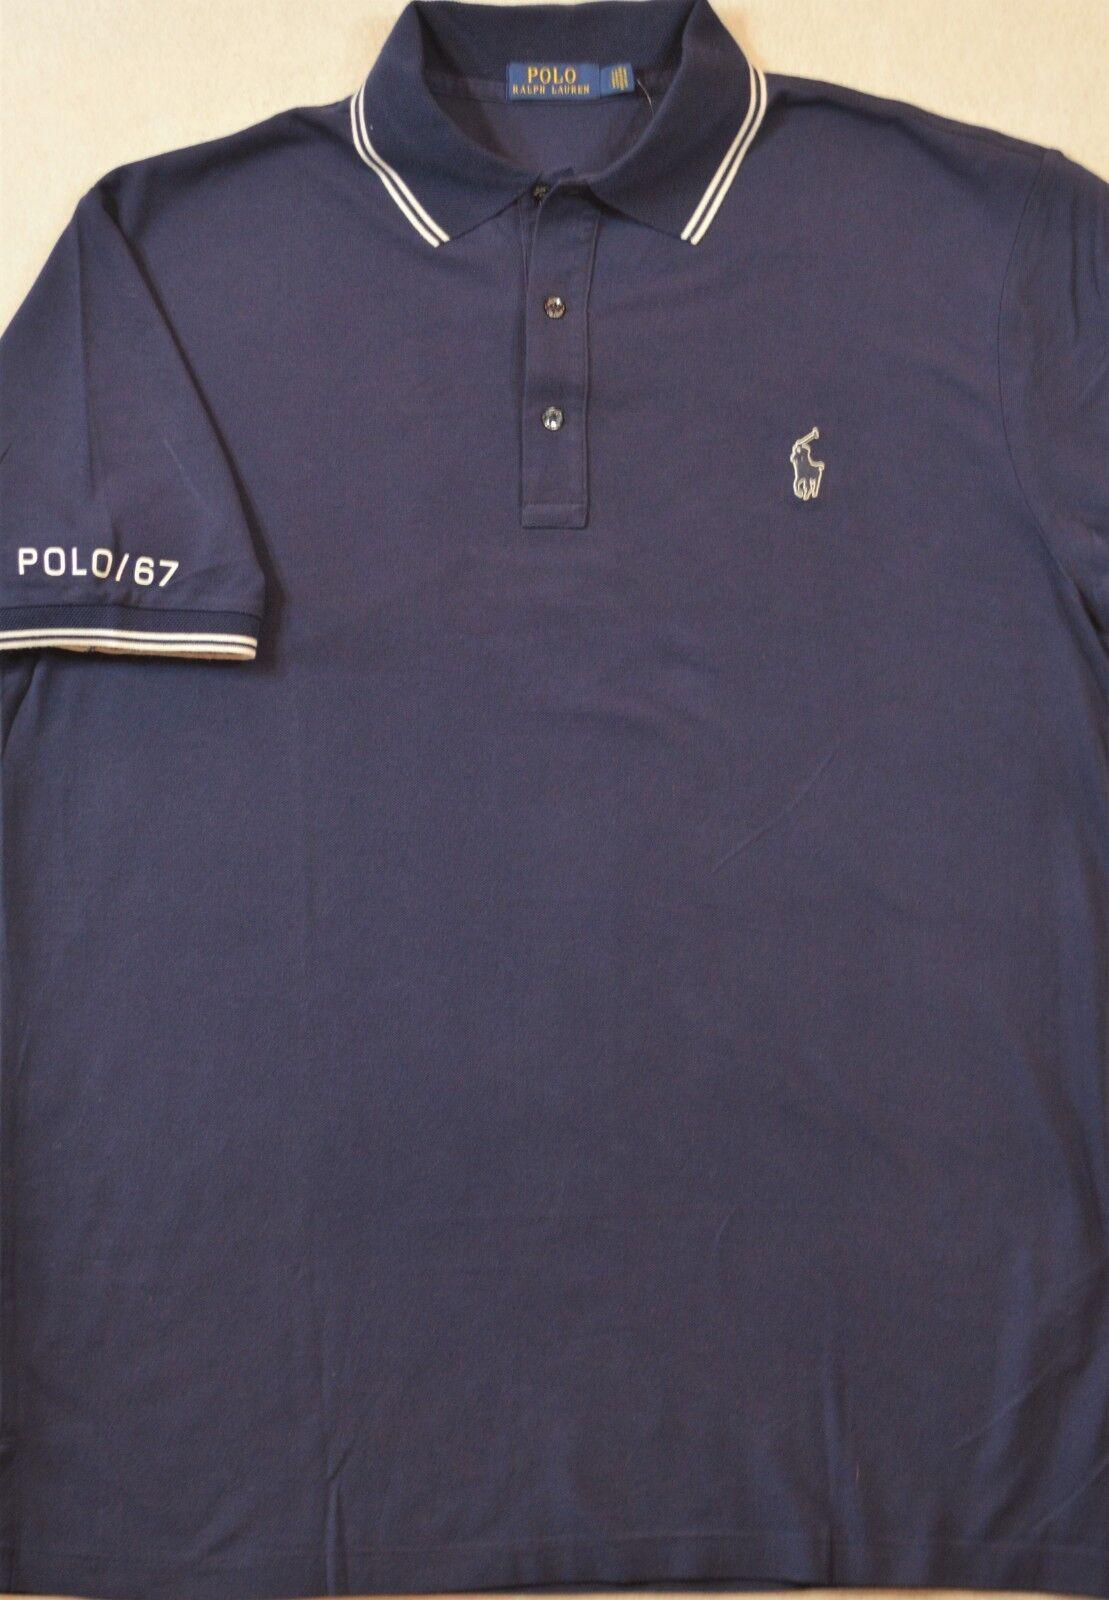 Polo Ralph Lauren Navy Mesh Shirt 2XB 2XLT 3XB 3XLT NWT